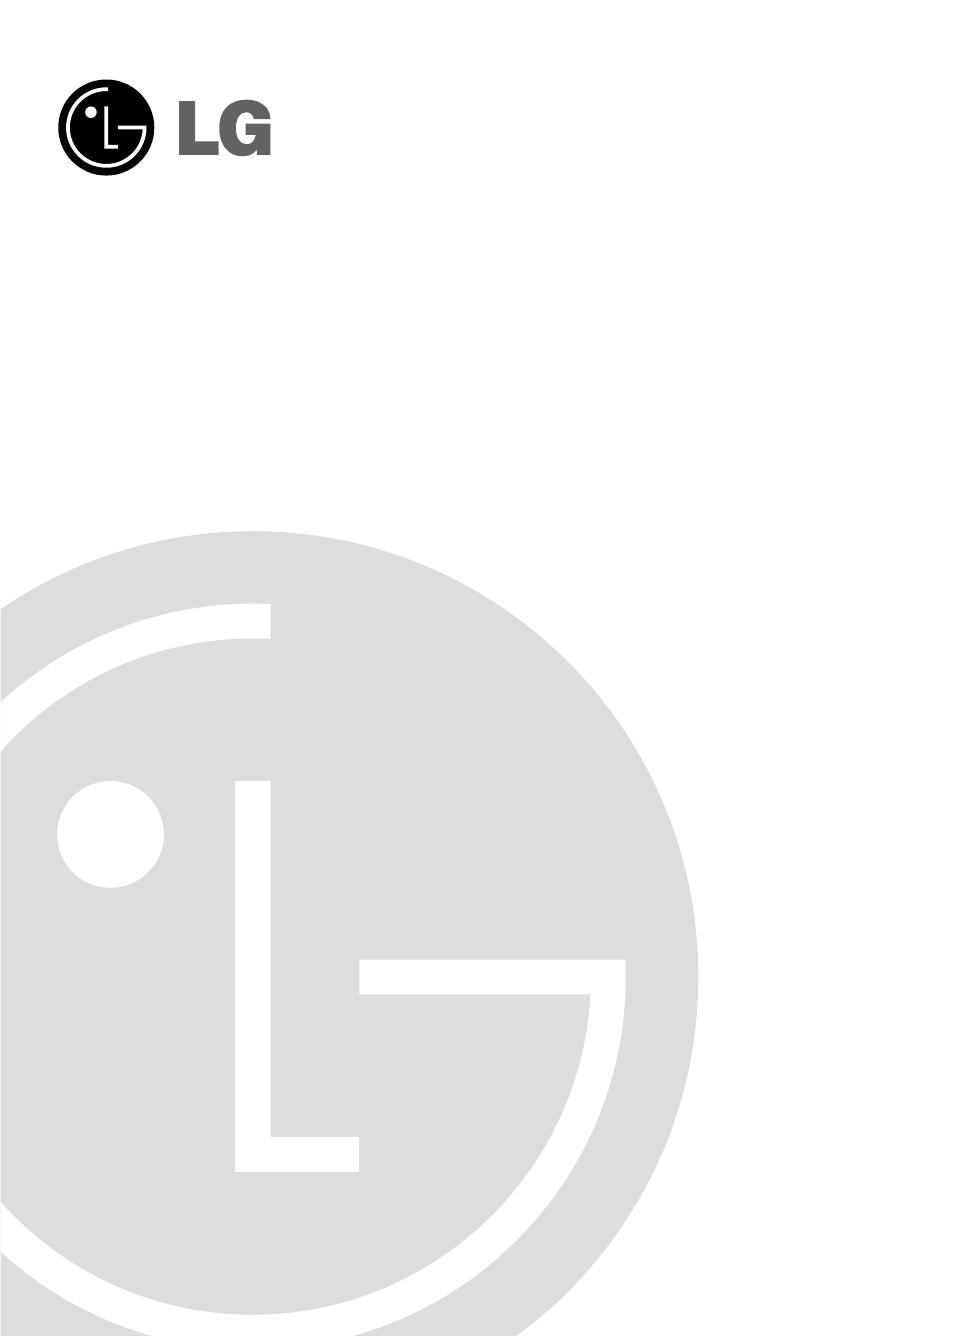 Инструкция LG Wd 10130n - картинка 2